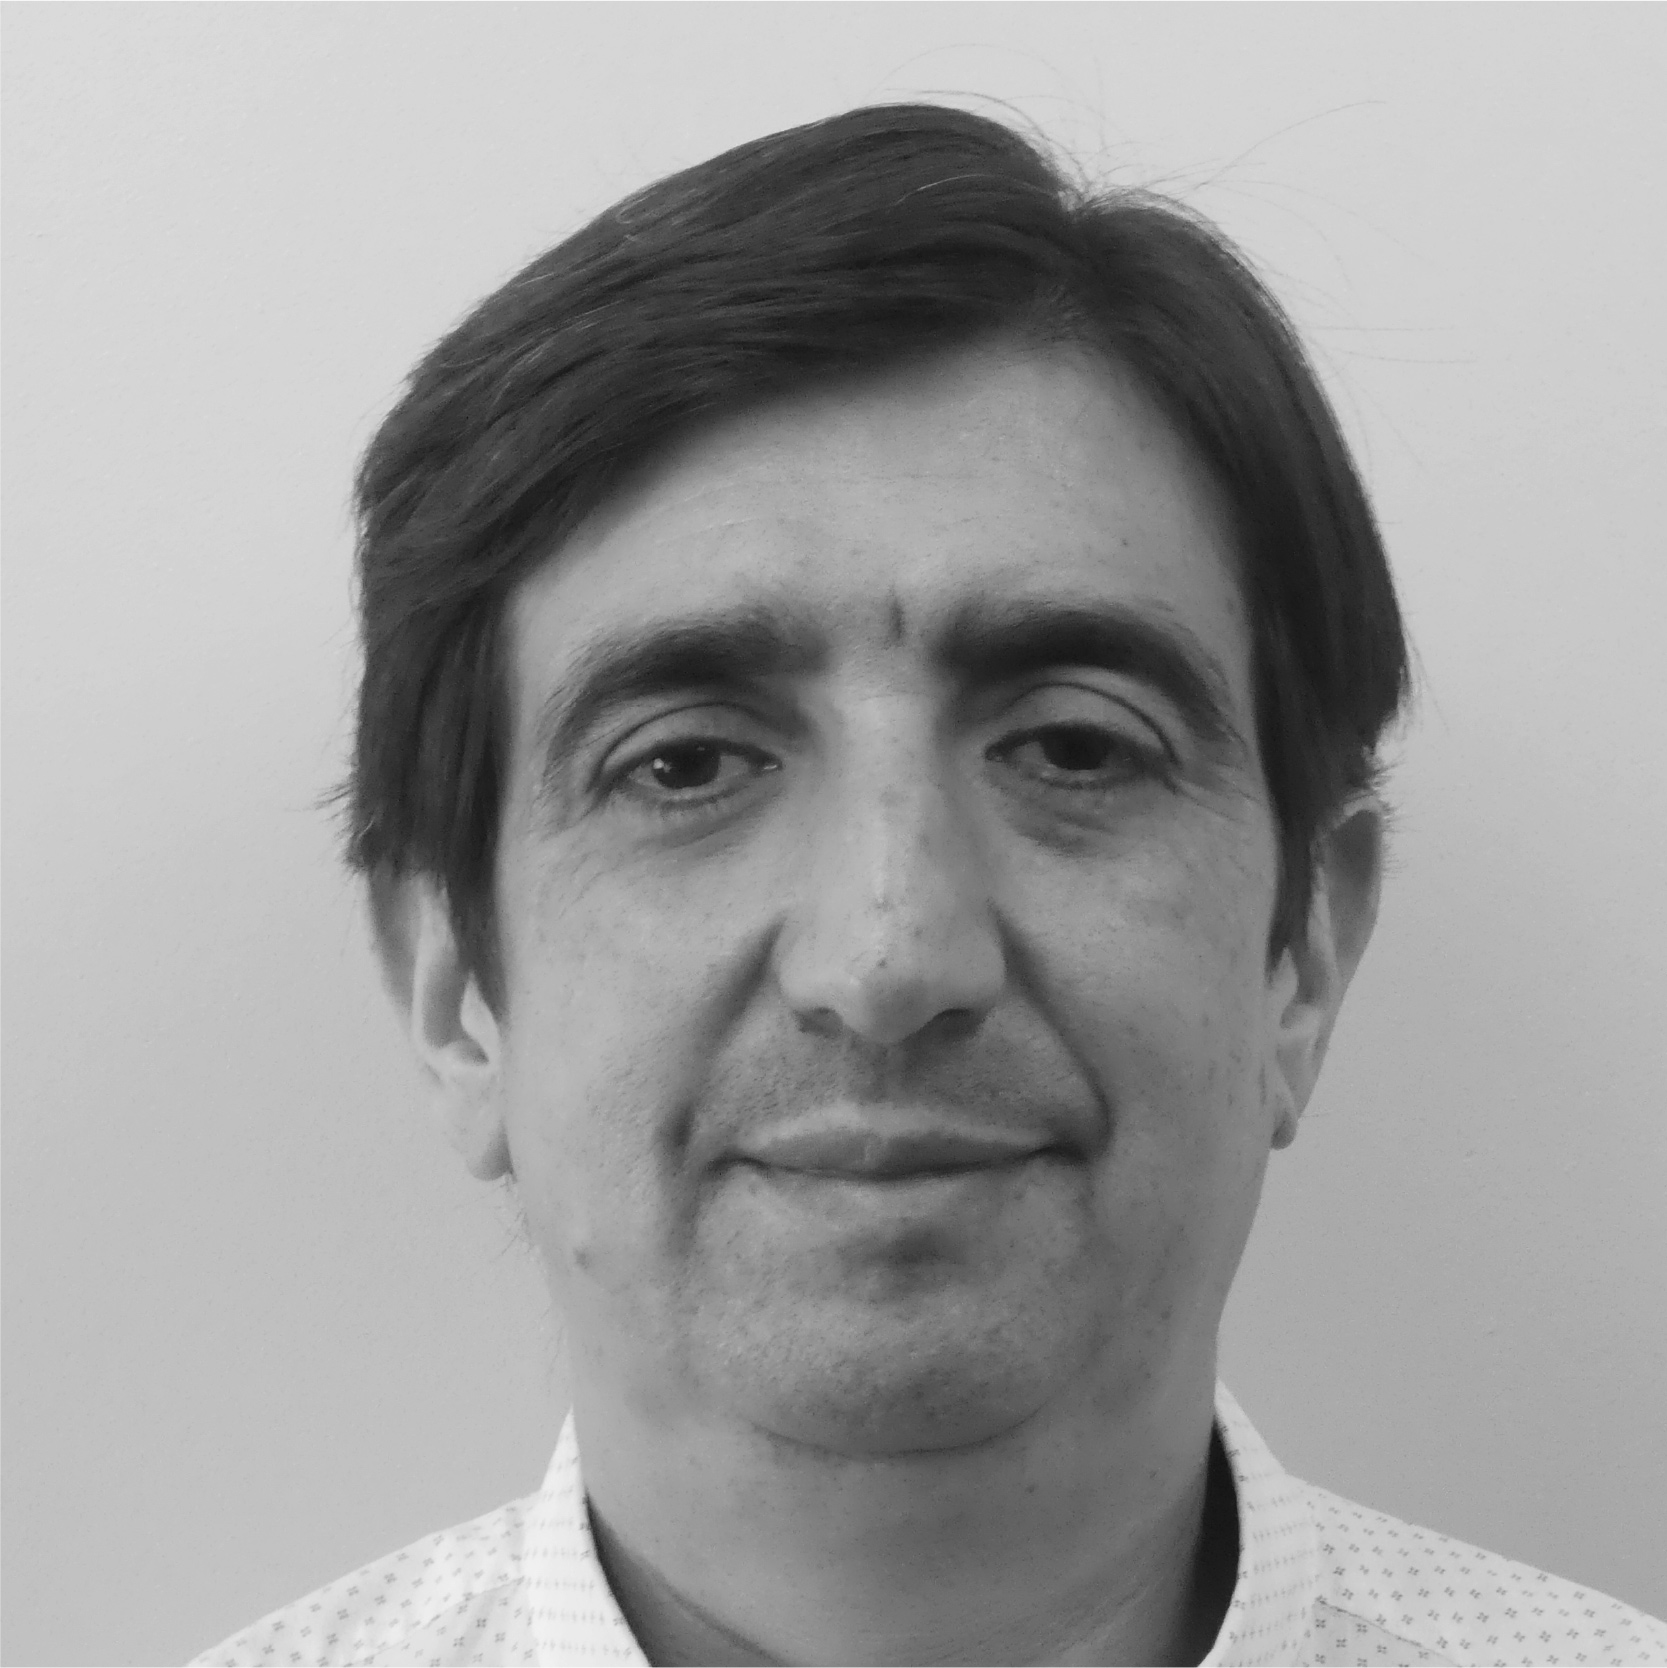 Mauricio Francisco Lemus Vera